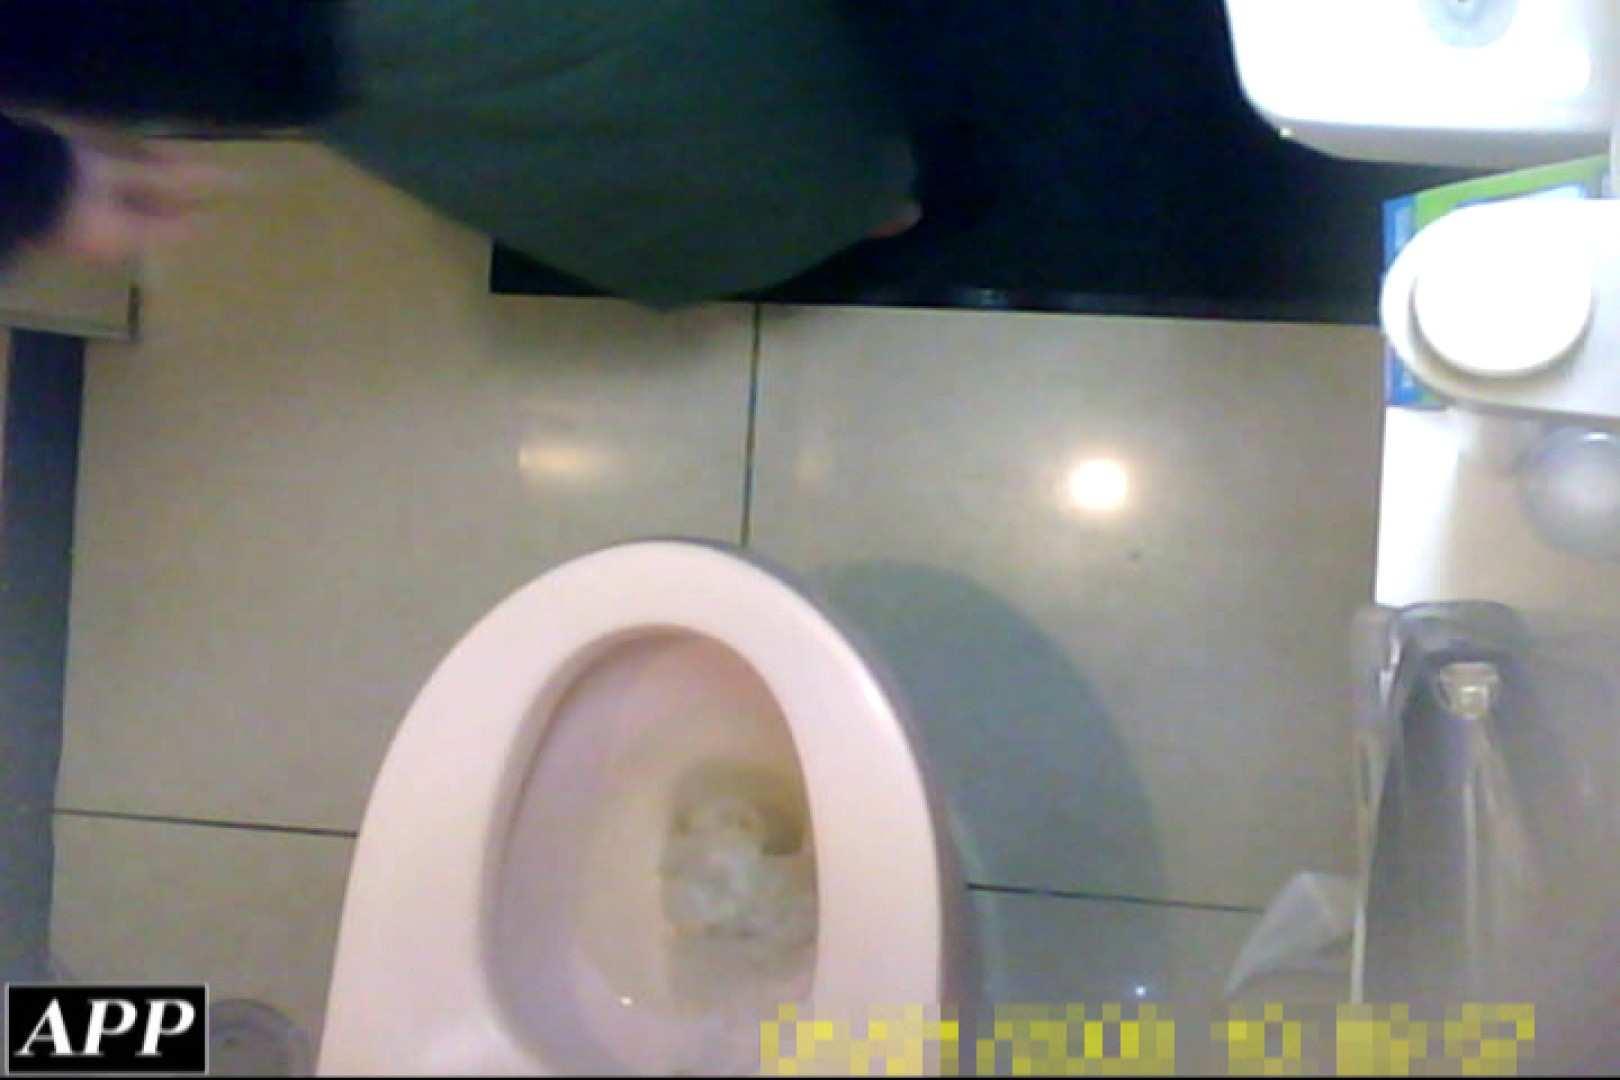 3視点洗面所 vol.095 OLセックス | 洗面所  87画像 19